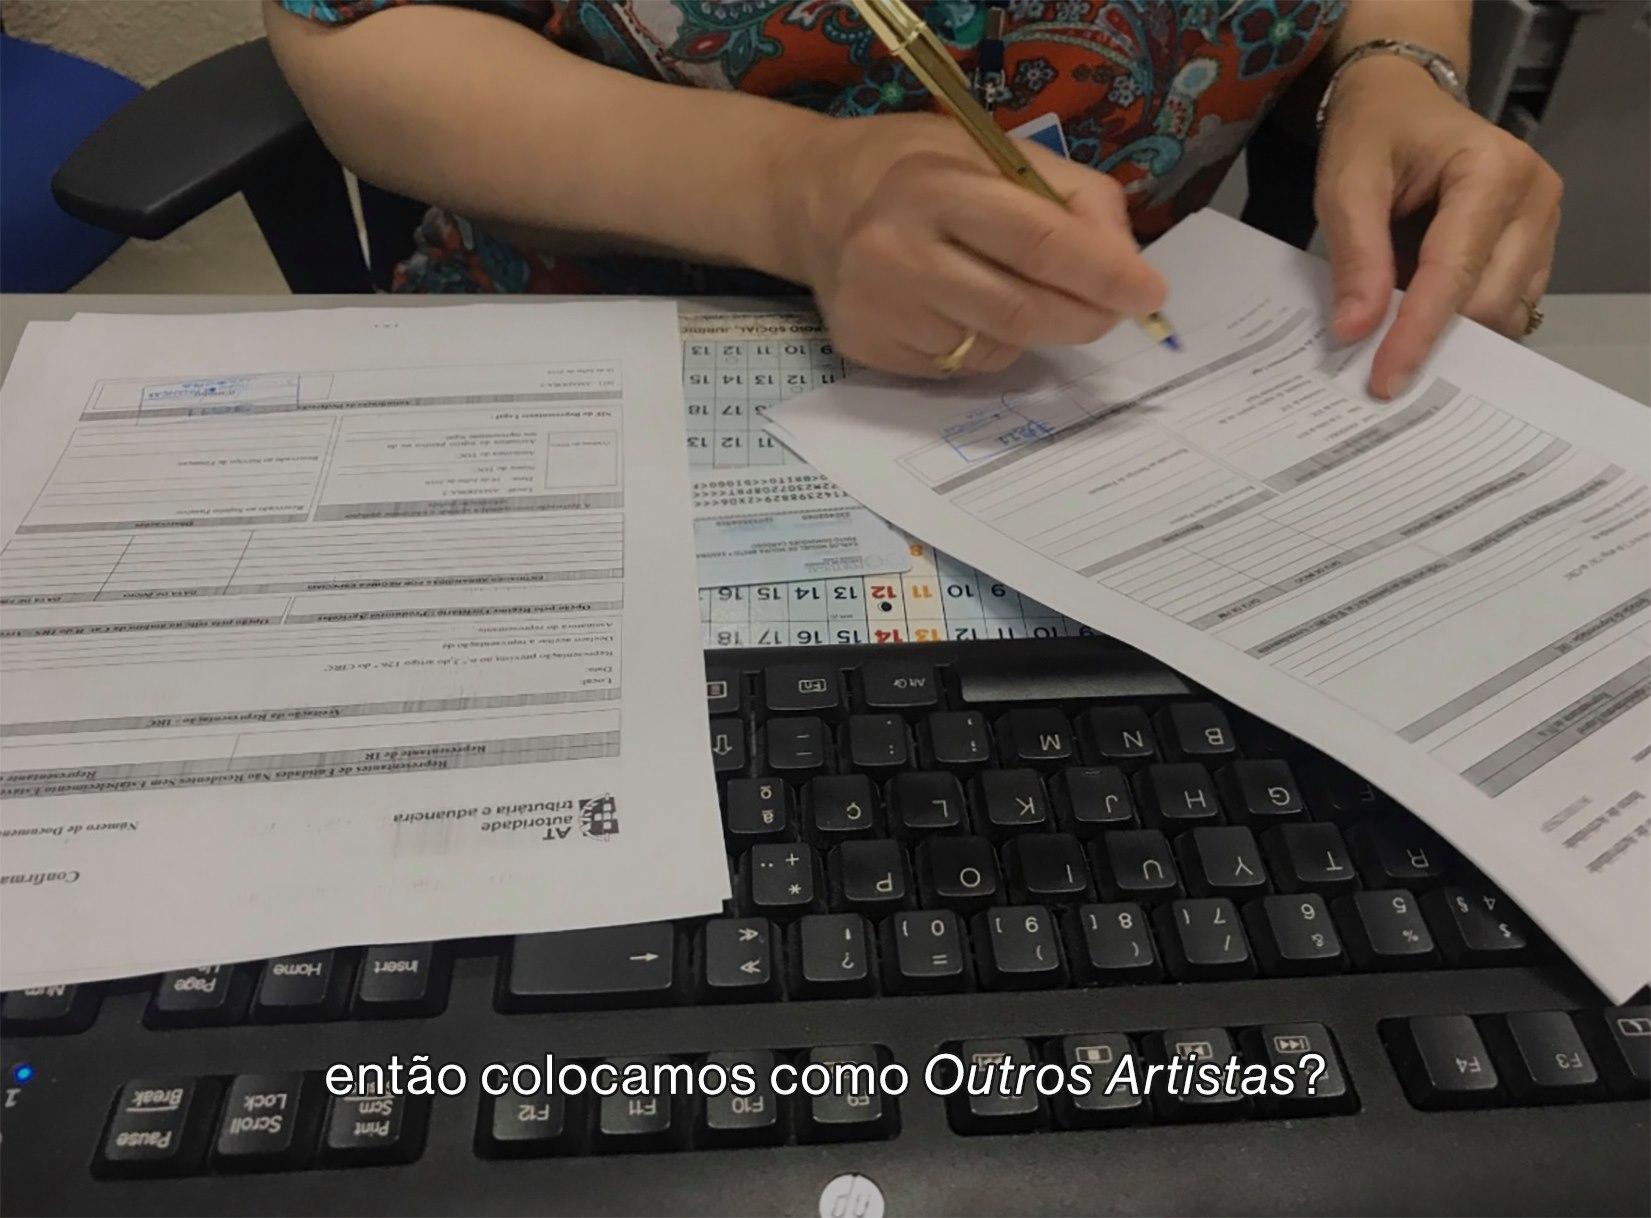 AMADORA-3 ⬤ Diogo Brito (c/ curadoria de Filipa Nunes)